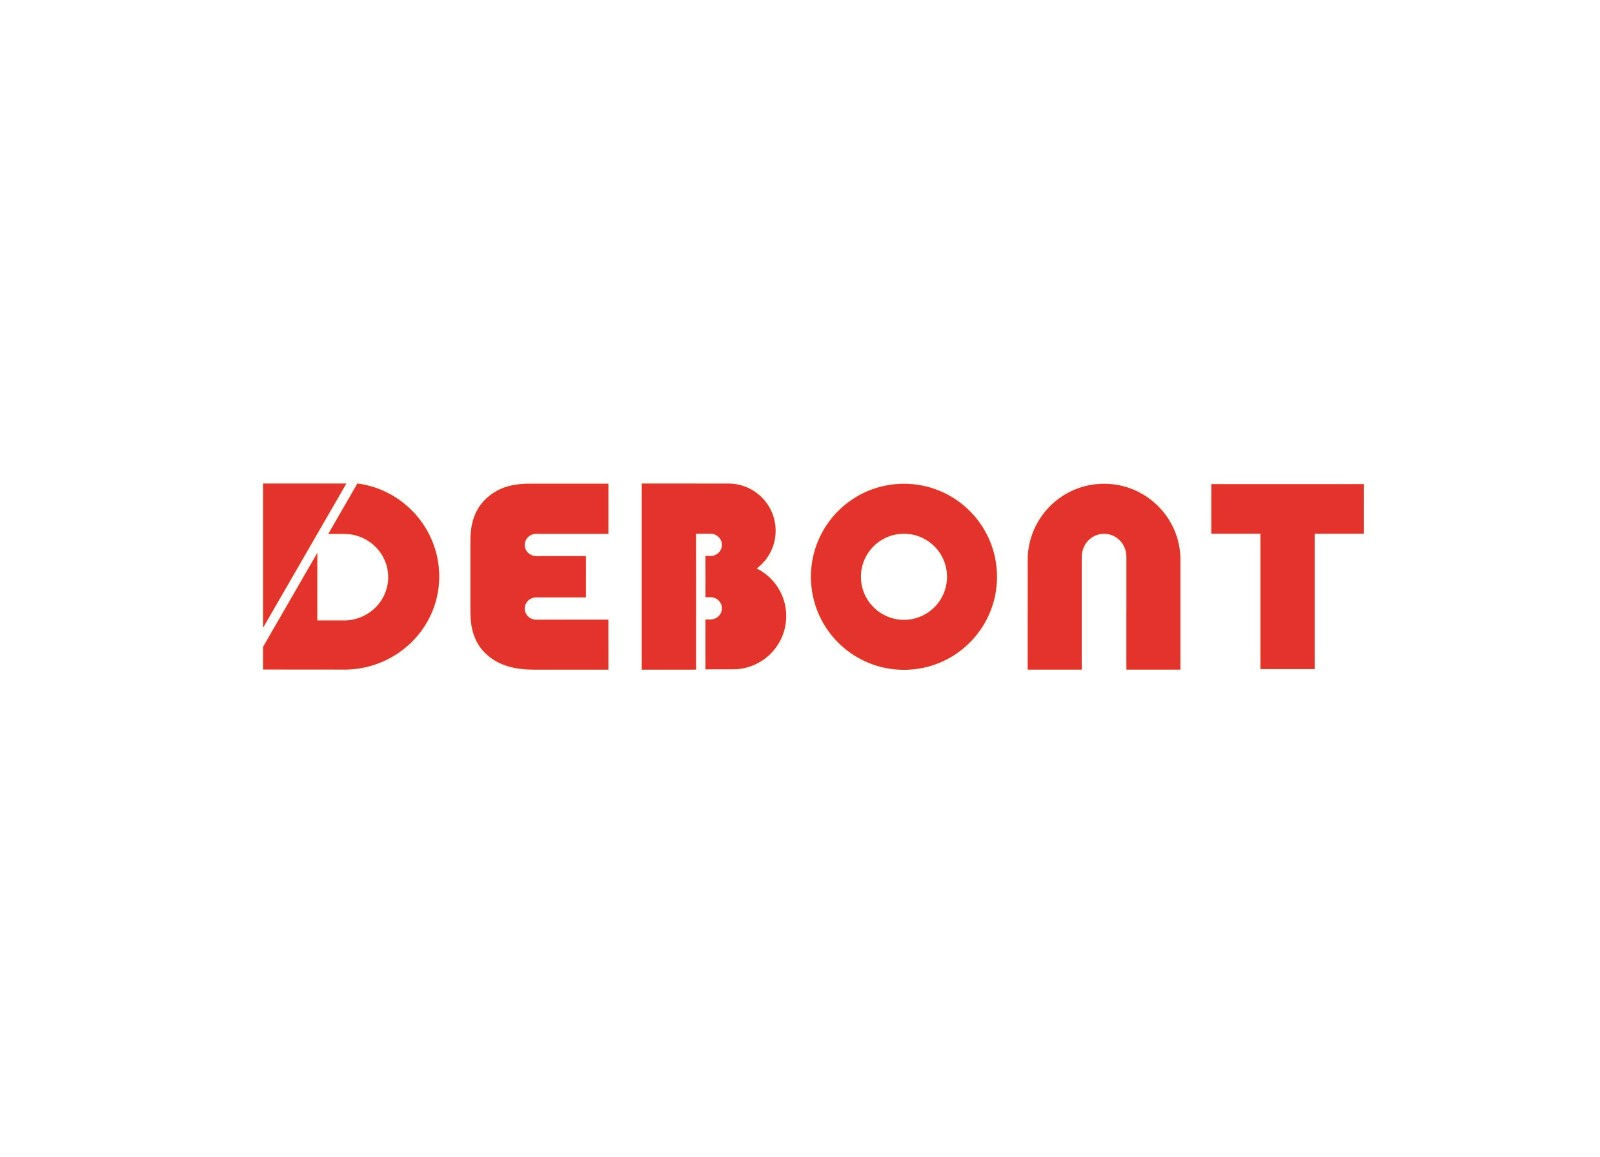 DEBONT CORP